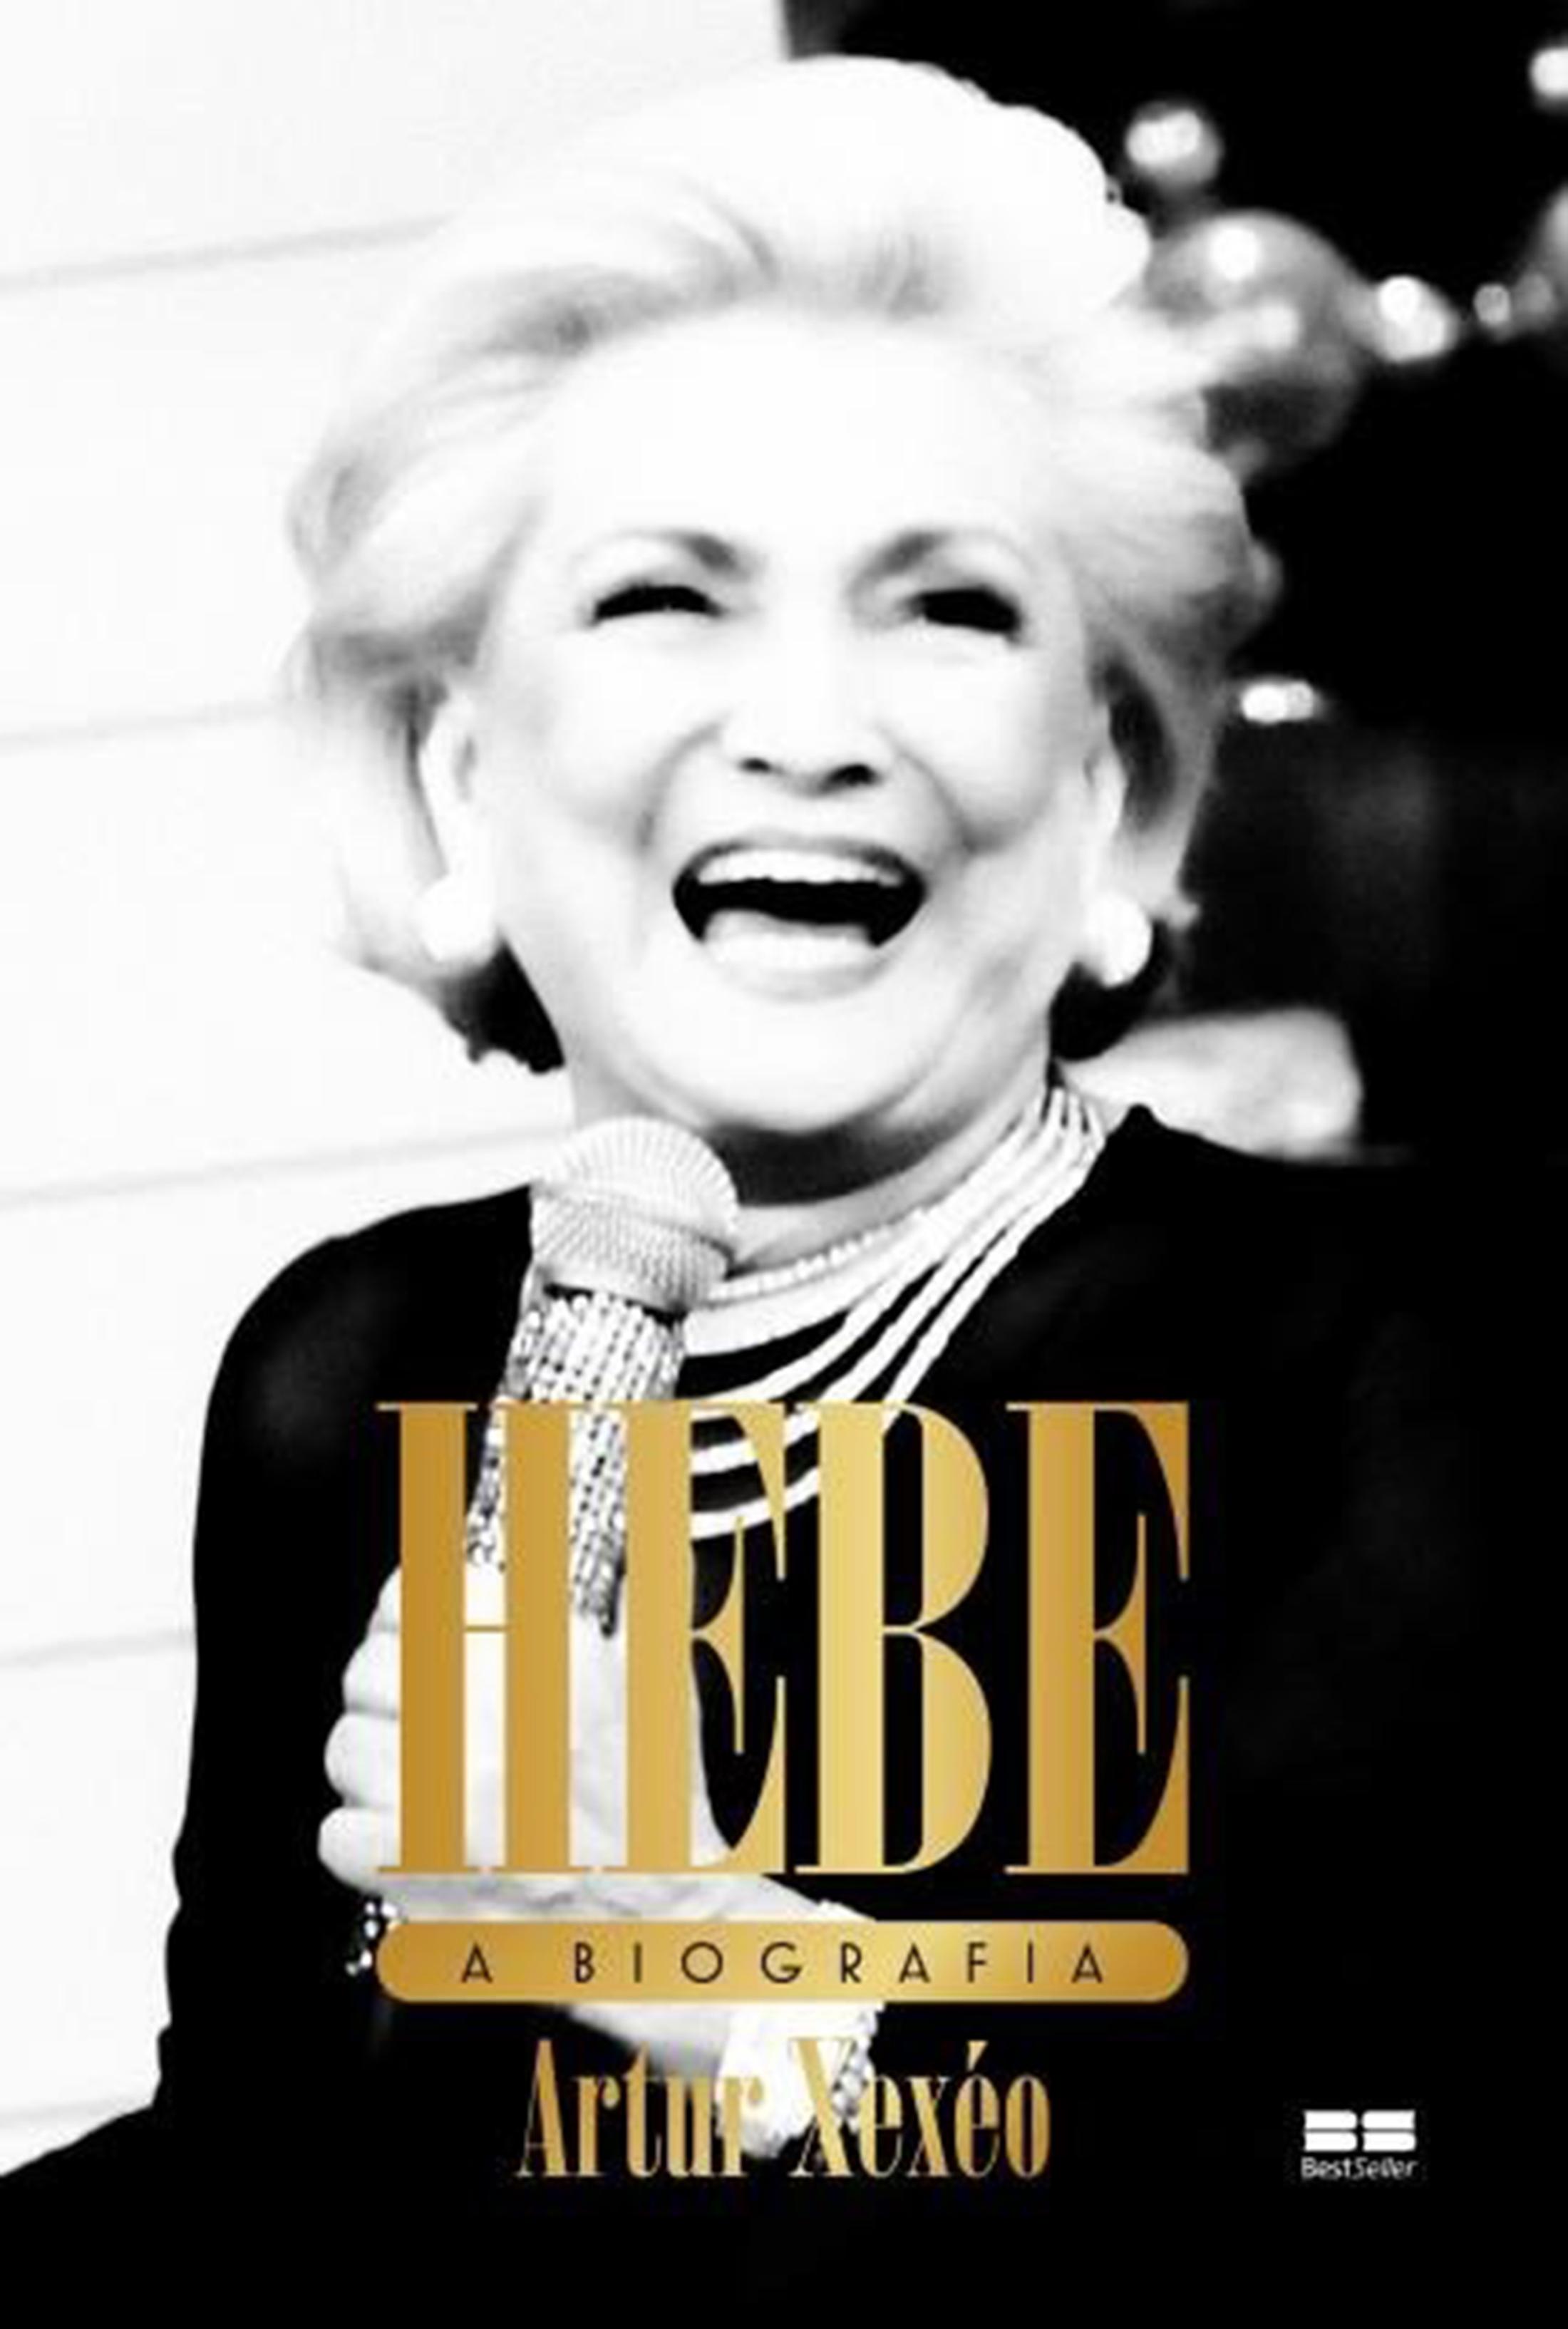 Livro de Hebe Camargo